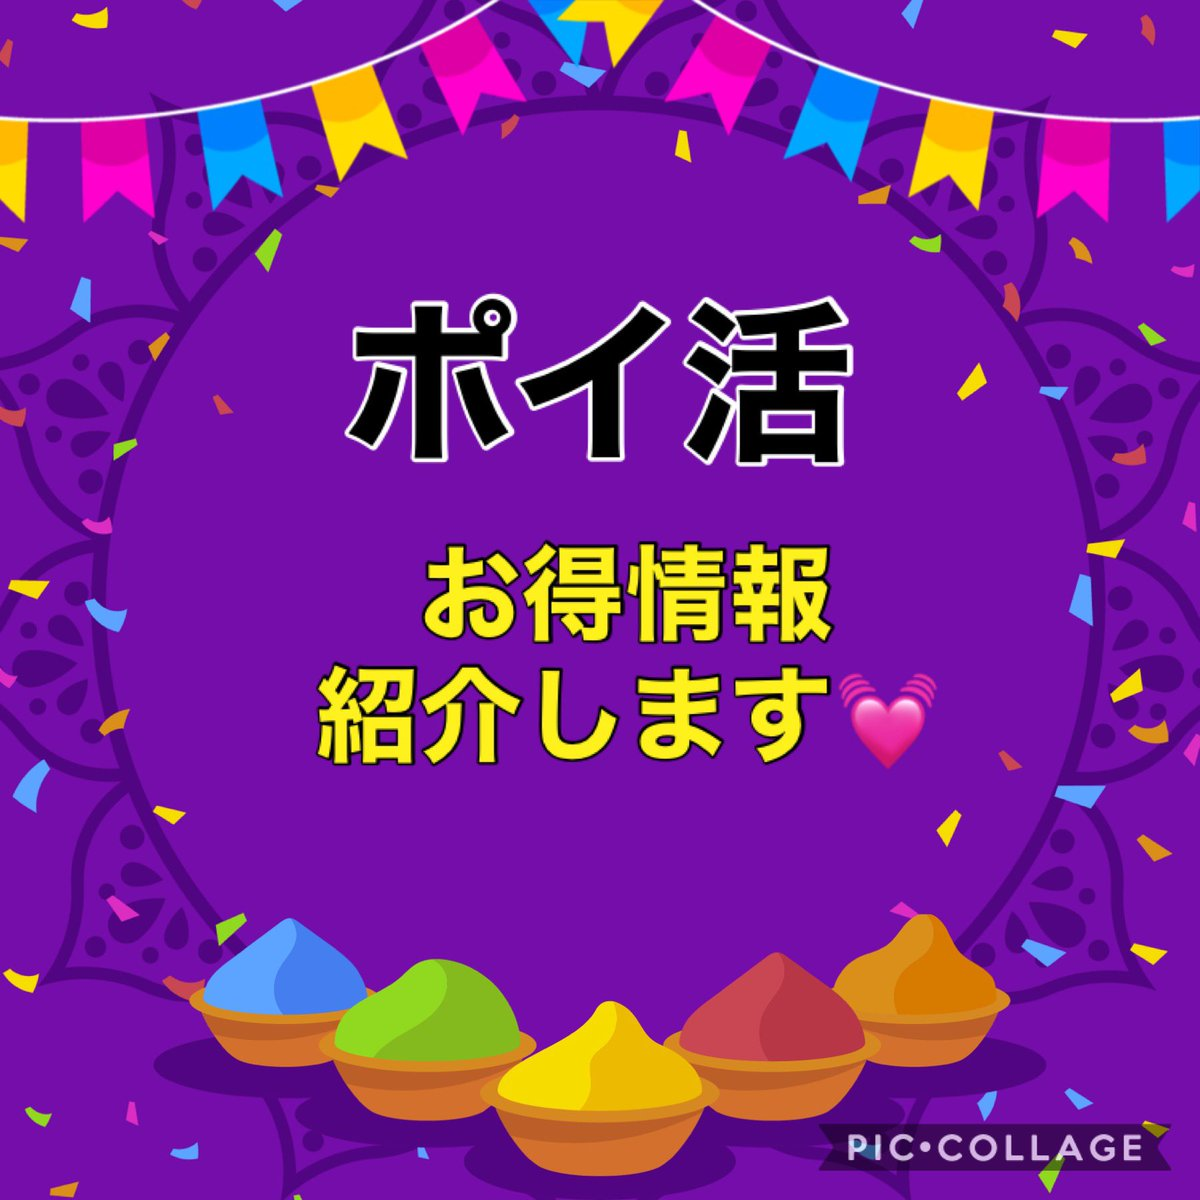 test ツイッターメディア - #Famipay #ウェル活 #ポイ活   ライブメディア👇  https://t.co/RGdELeE5pS  ワラウ👇 https://t.co/Rx3Ykciv2S   ポイントインカム👇 https://t.co/RpFi93c4AG 紹介コード→【rbf881340969】  モッピー👇 https://t.co/5fkfixv5Ve  ポイ活まとめ🌸 https://t.co/2rg225w1HB https://t.co/WclDCz2CMl